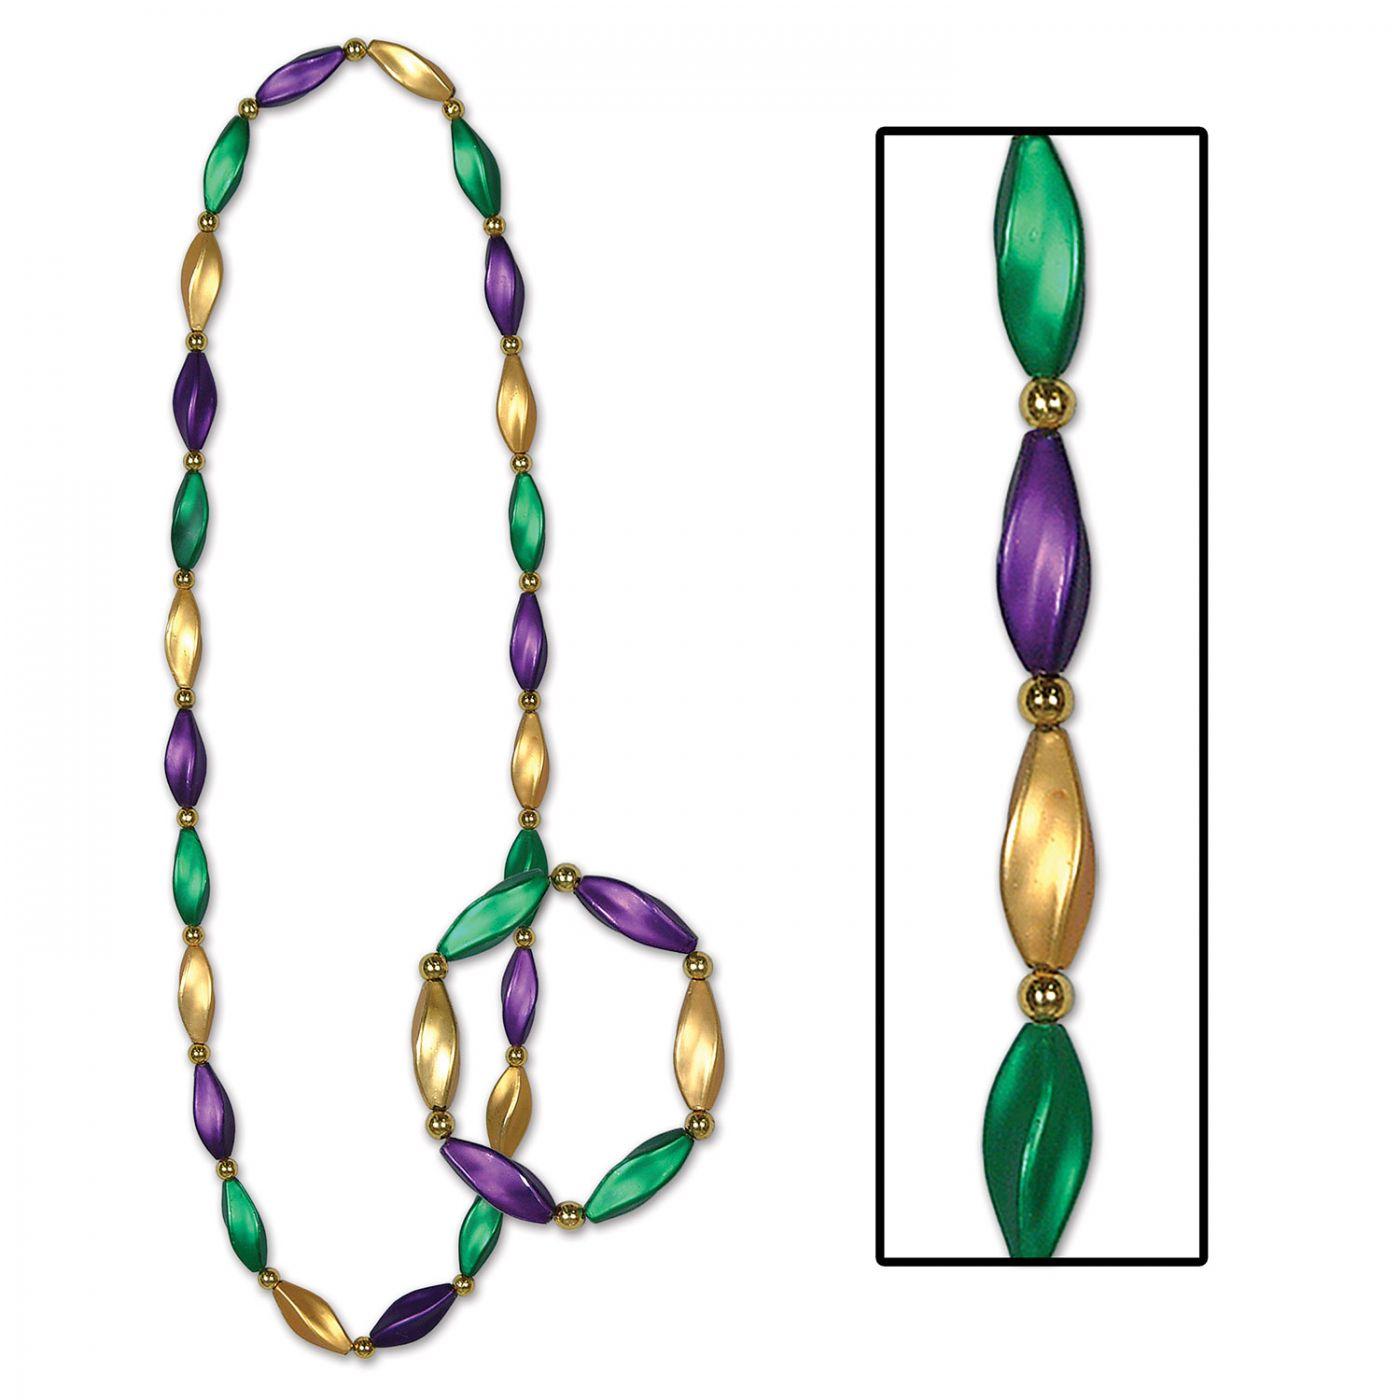 Satin Swirl Beads/Bracelet Set image